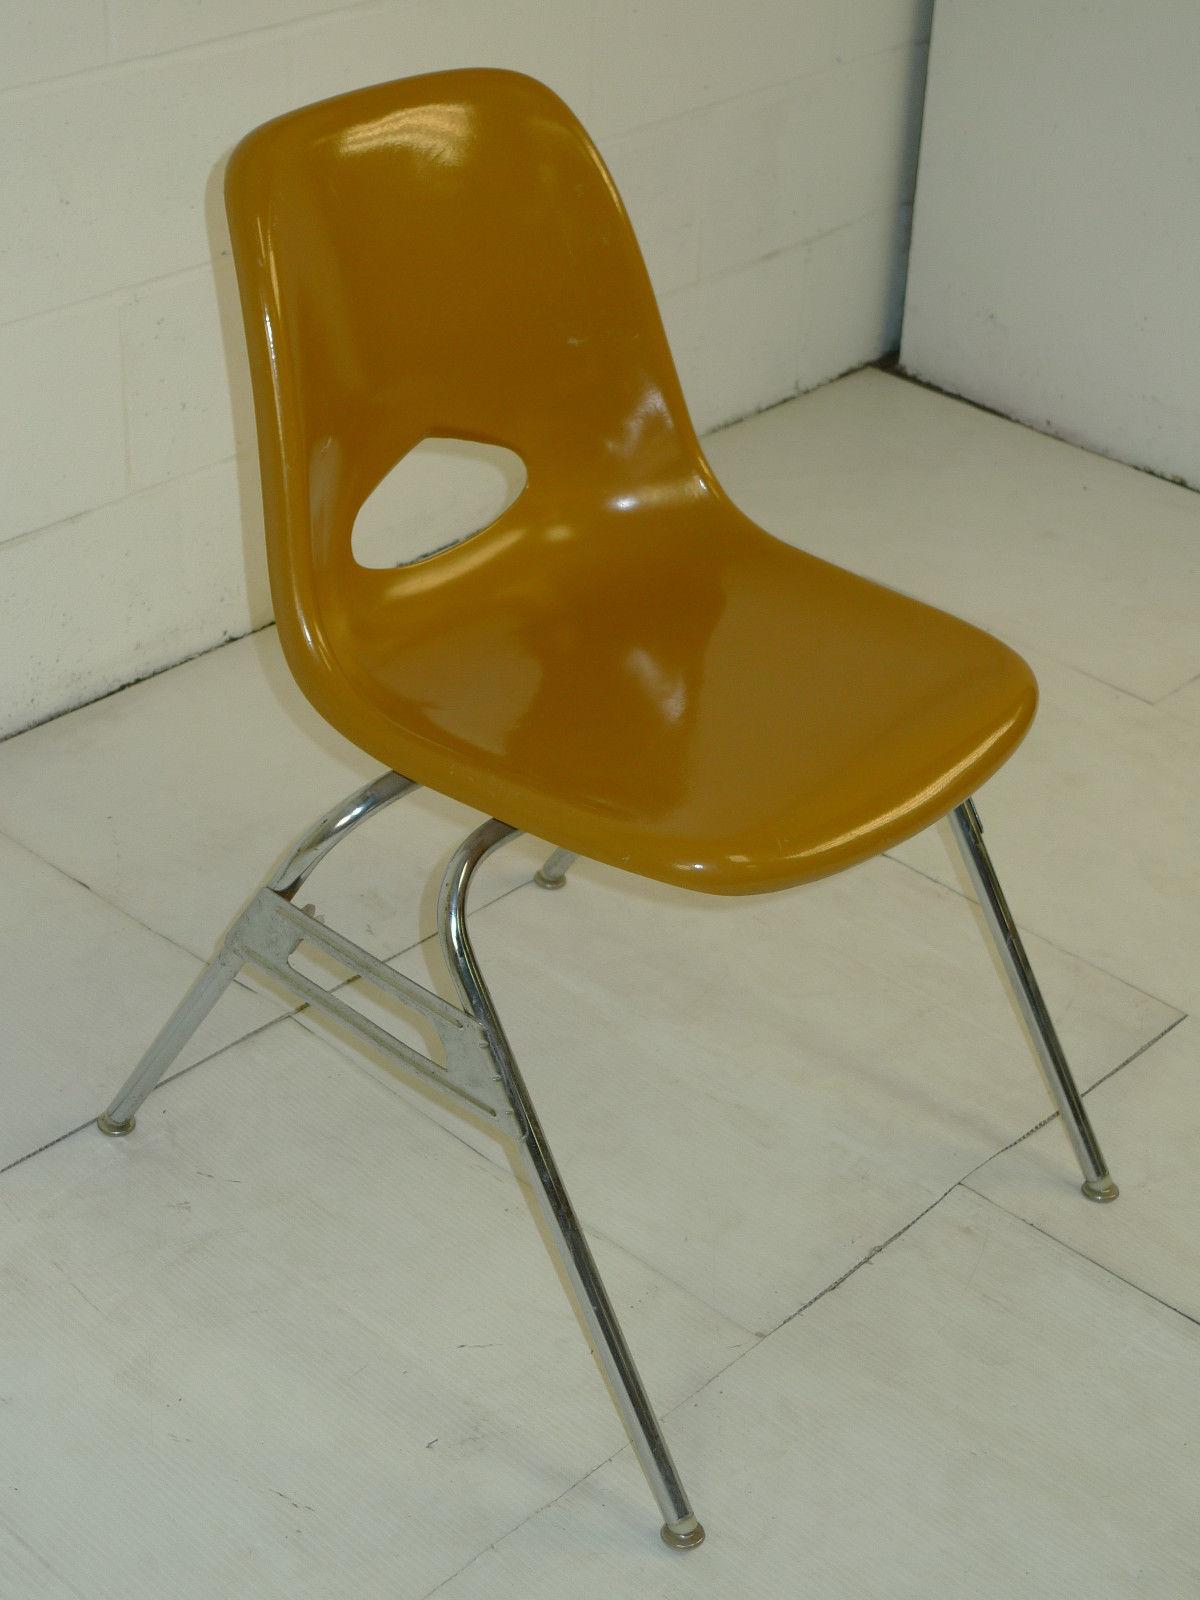 Brown Fiberglass Space Age Mid Century Modern Eames Era Chairs